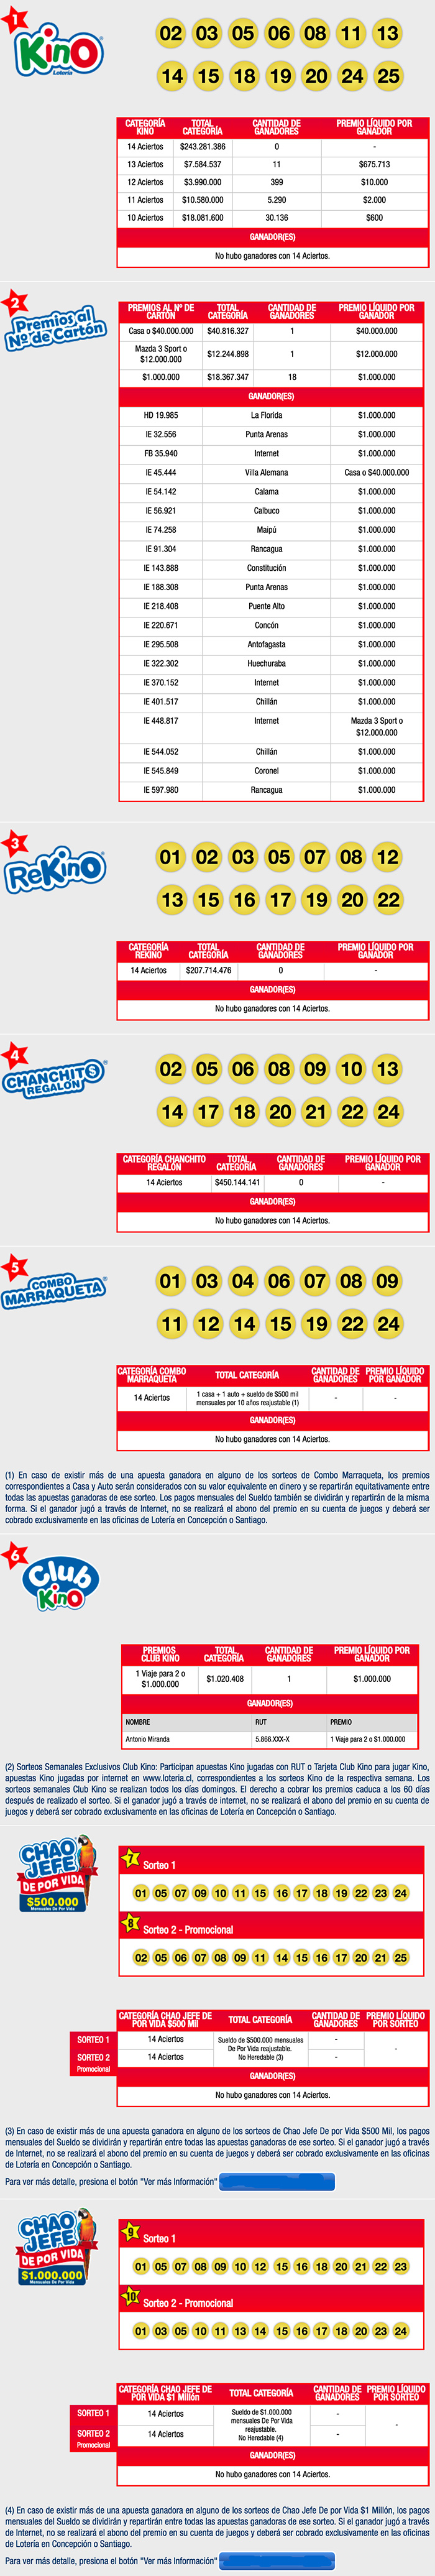 Resultados Kino Loteria 2107